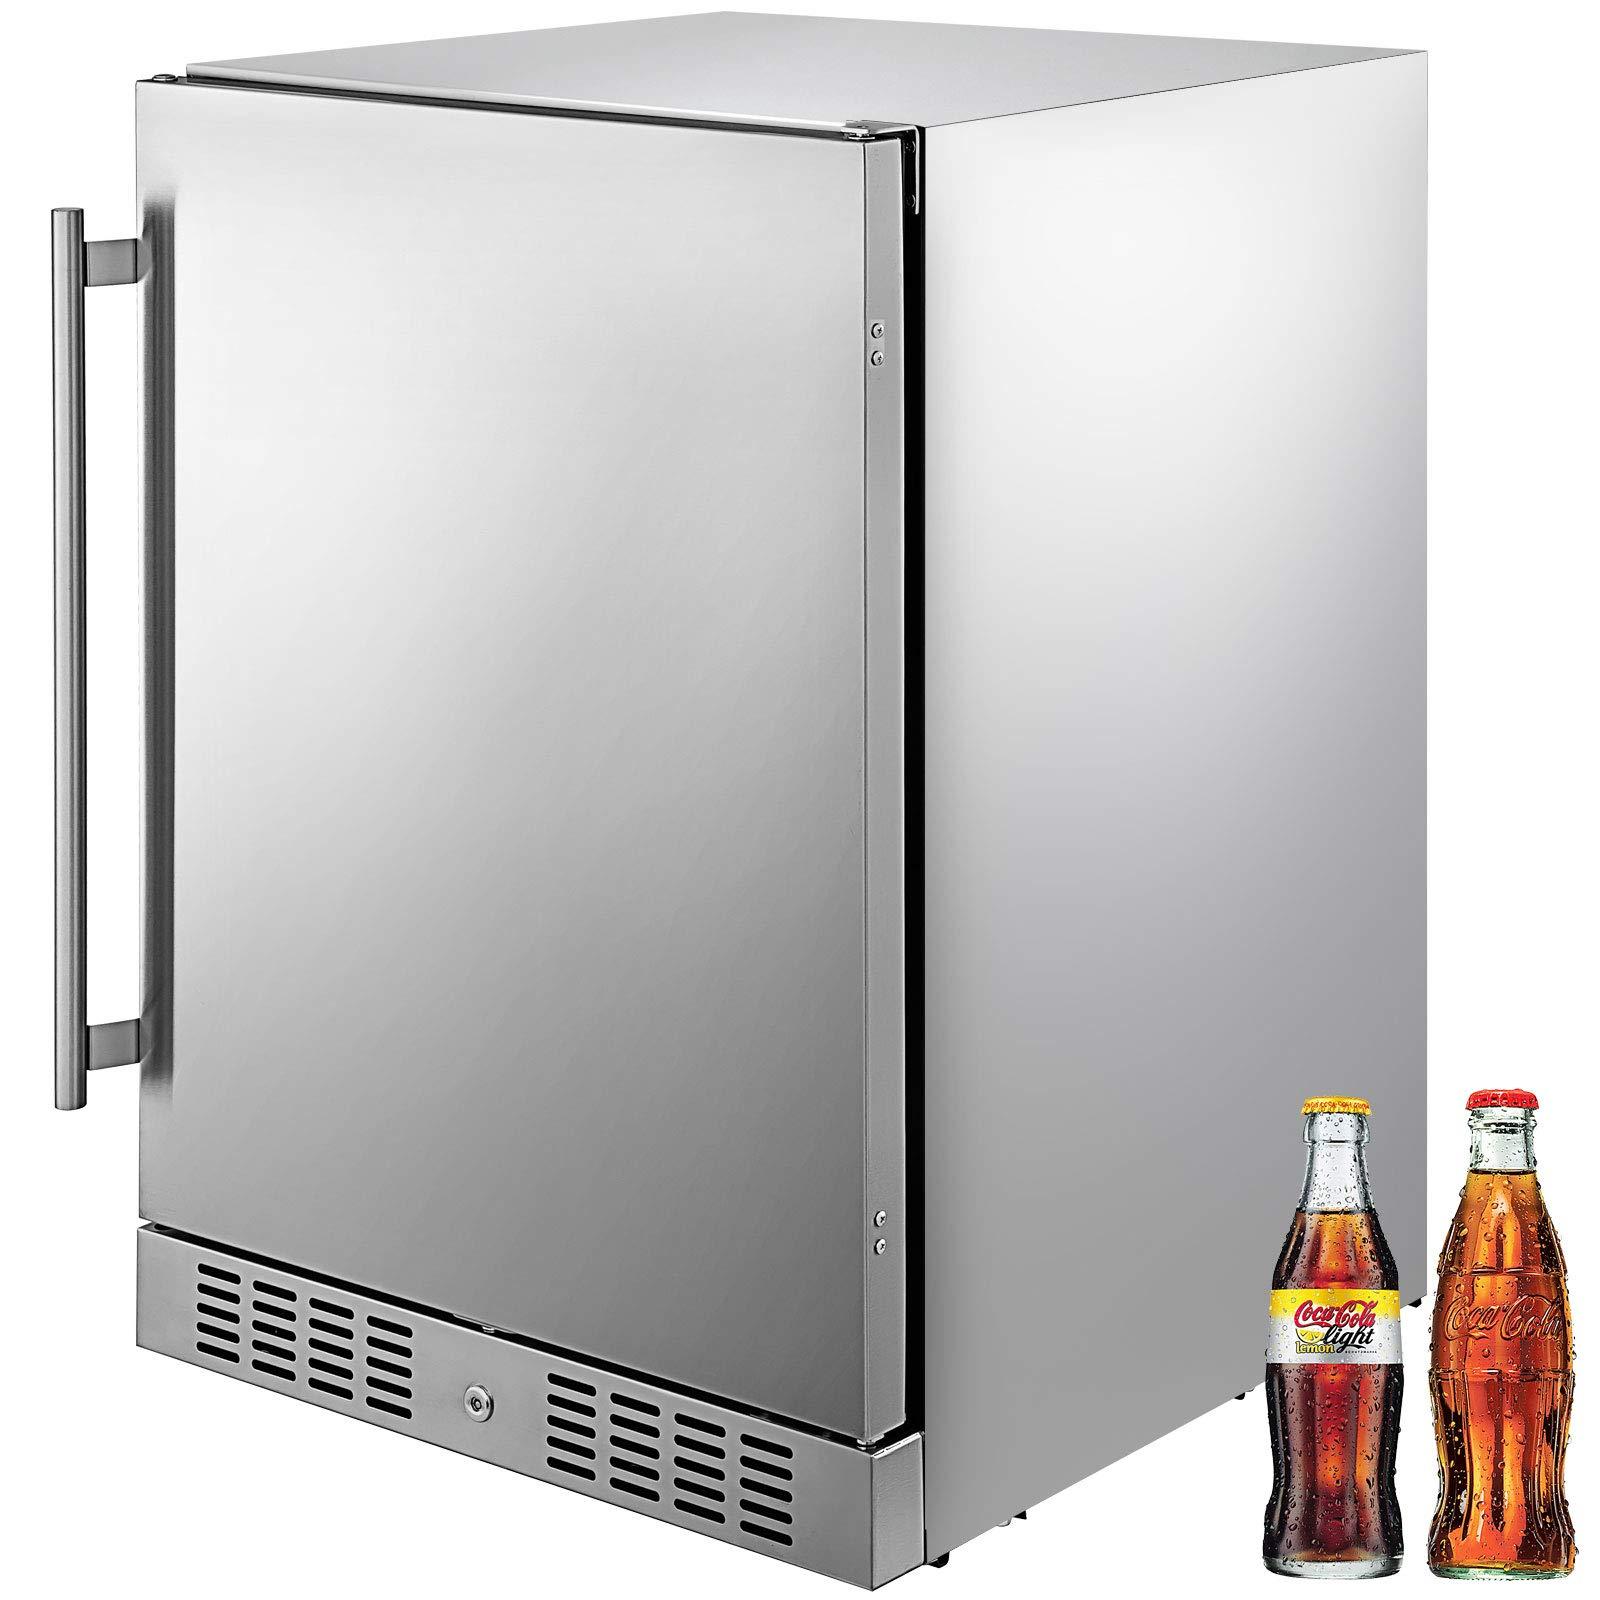 VBENLEM Stainless Reversible Refrigerator Commercial